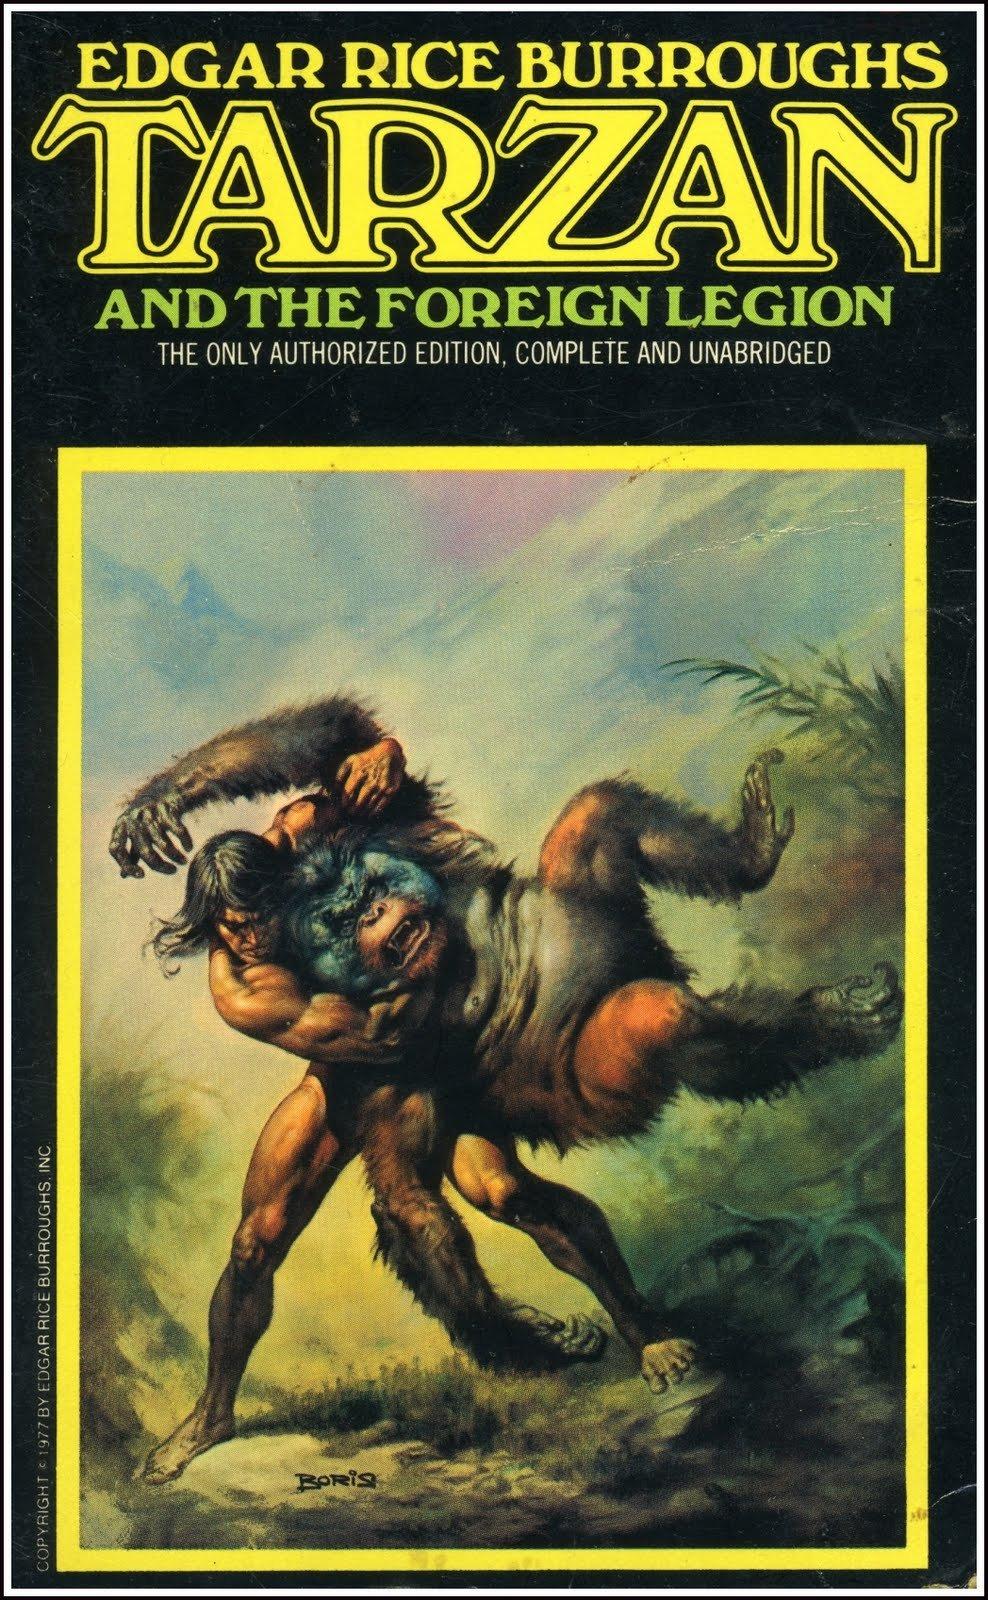 ERBzine 3610 Tarzan Ballantines  Adams and Boris